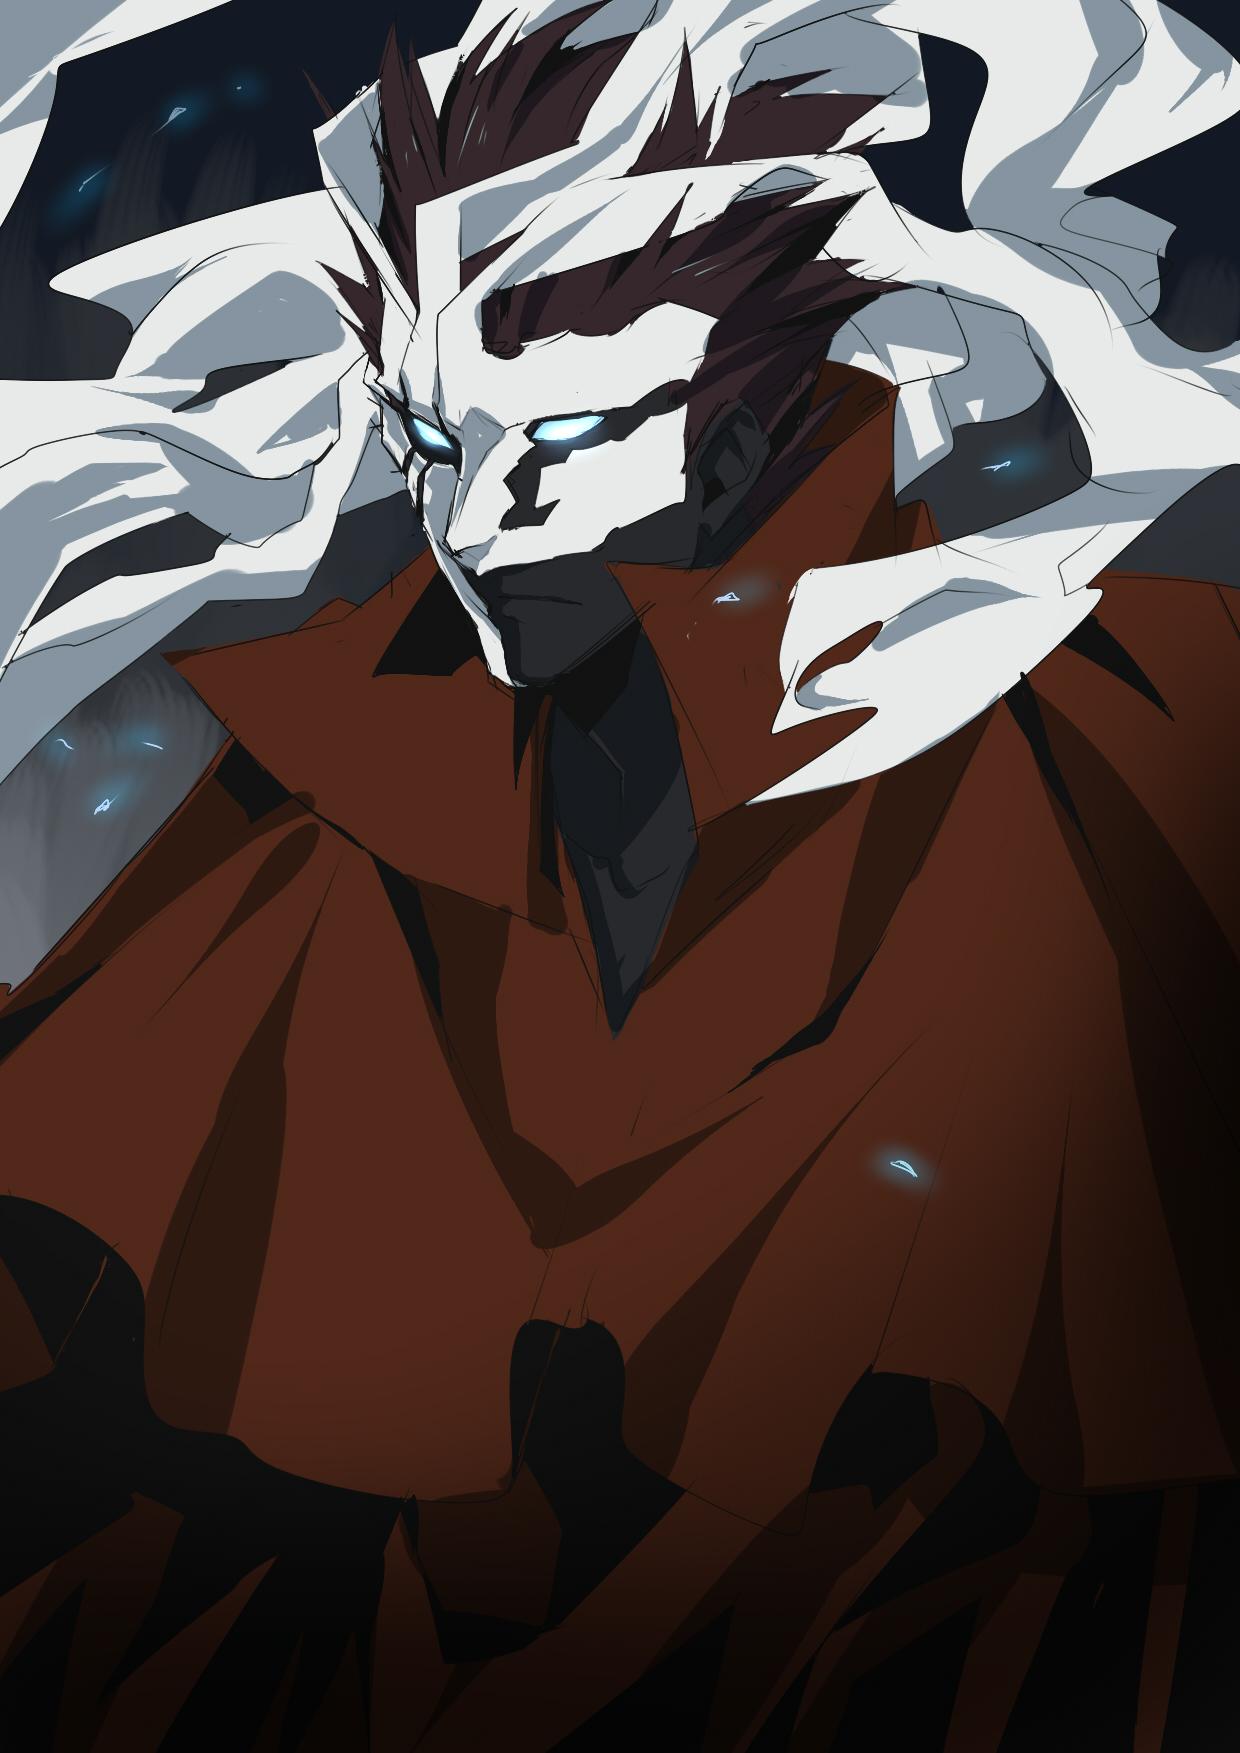 Ergo proxy (character), fanart zerochan anime image board.